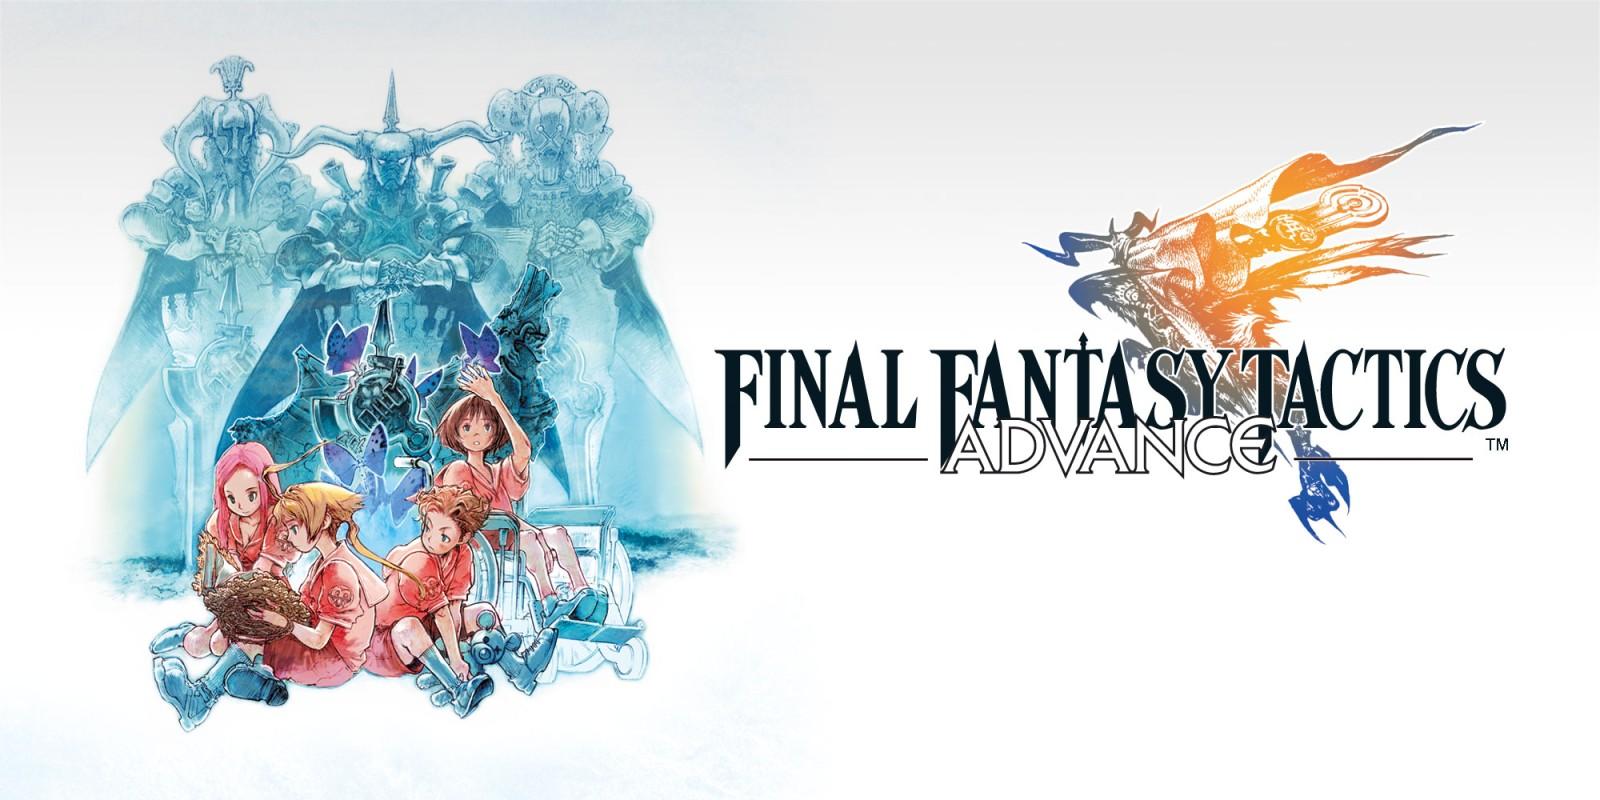 Final Fantasy Tactics Advance Game Boy Advance Games